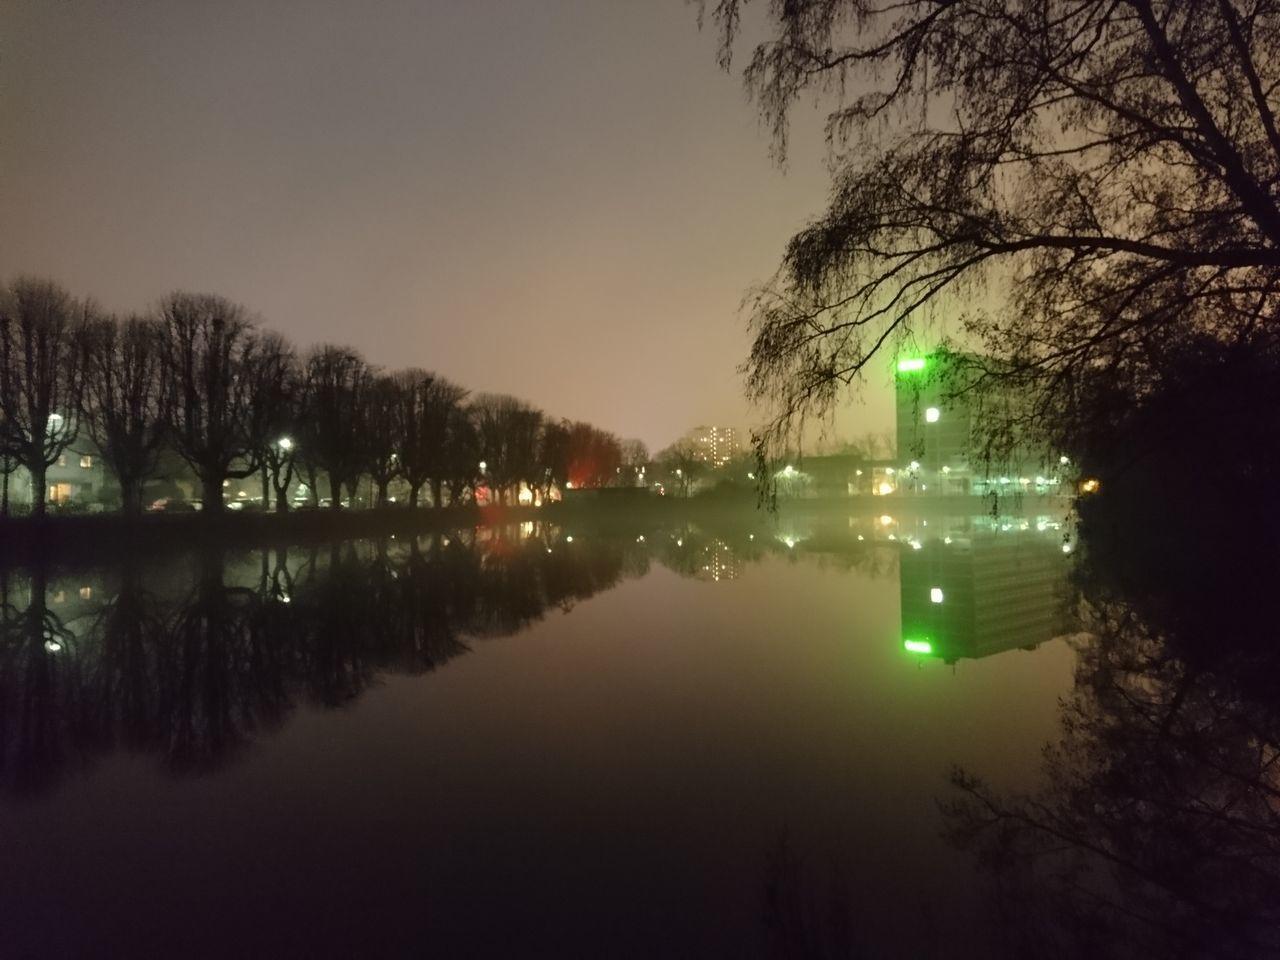 Gute nacht... Reflection Tree Water No People Outdoors Nature Good Night World EyeEm Best Shots EyeEm Deutschland Streamzoofamily Xperiaphotography IMography Sony Xperia Zr 🇩🇪Germany Sony Xperia Photography.